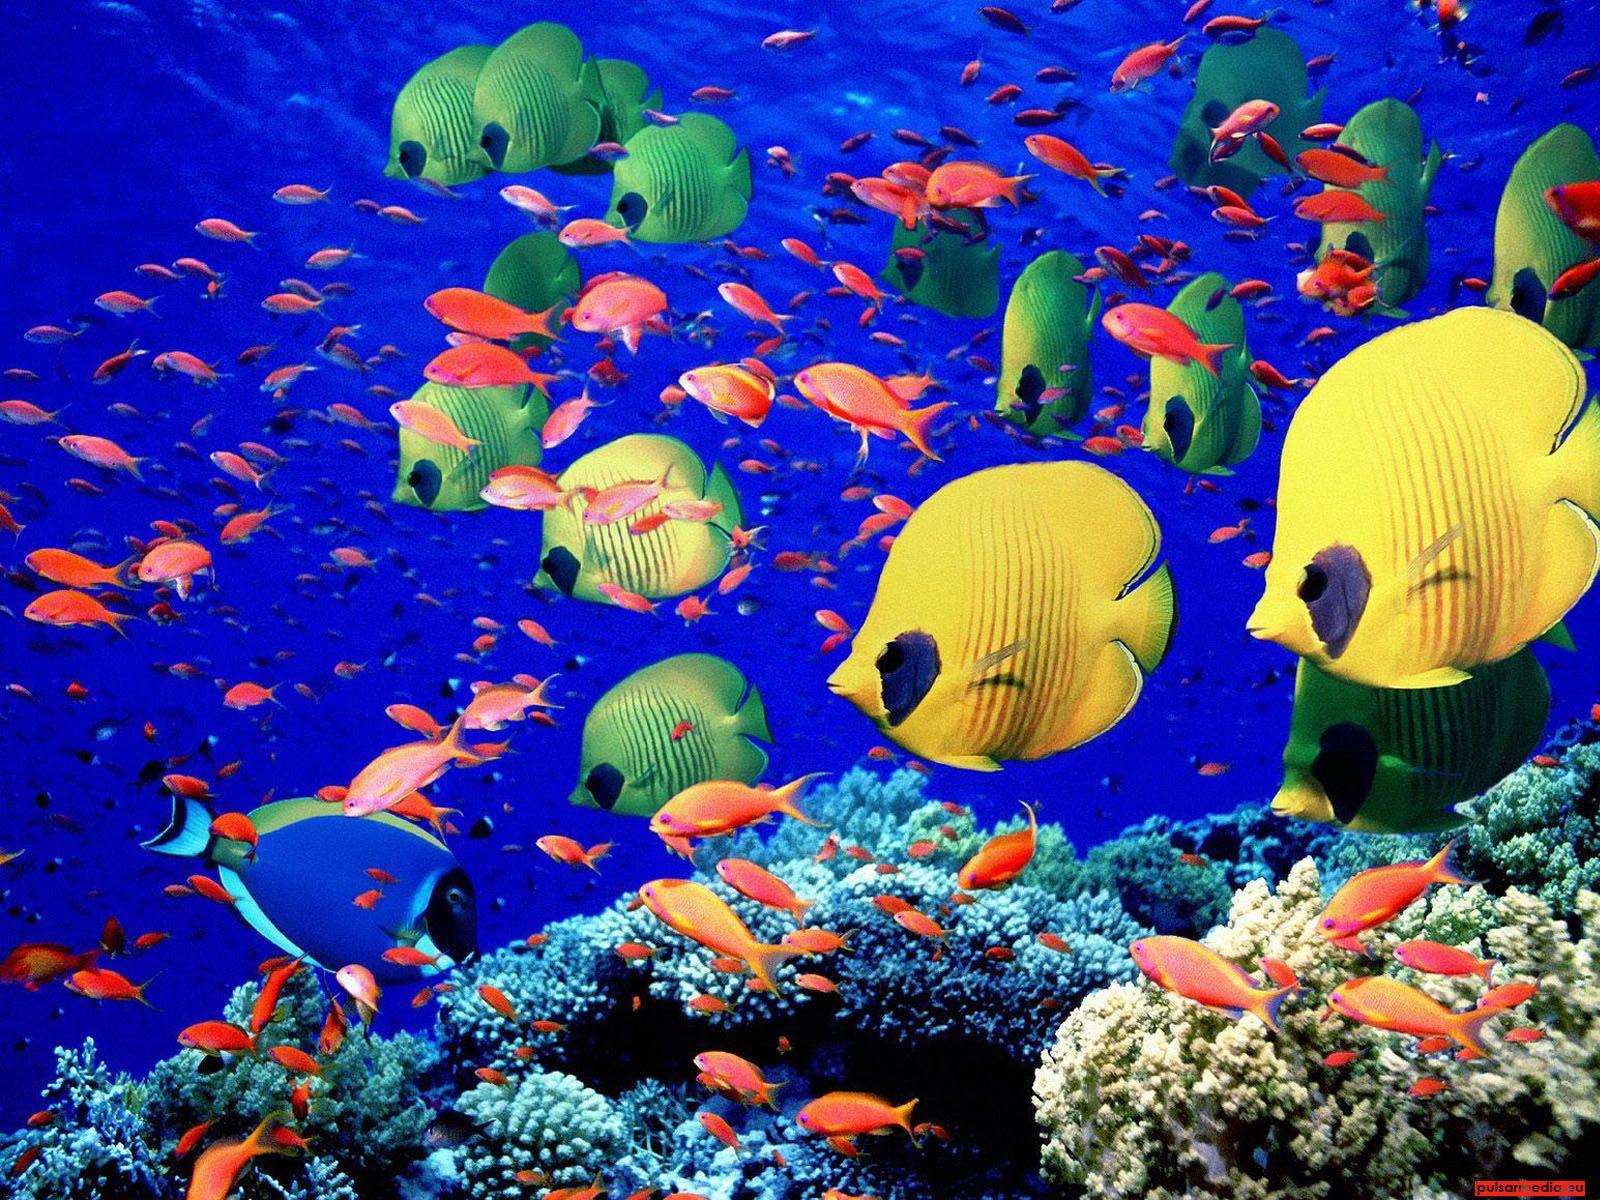 moving ocean desktop backgrounds animated wallpaper 3d aquarium ocean life wallpapers 076